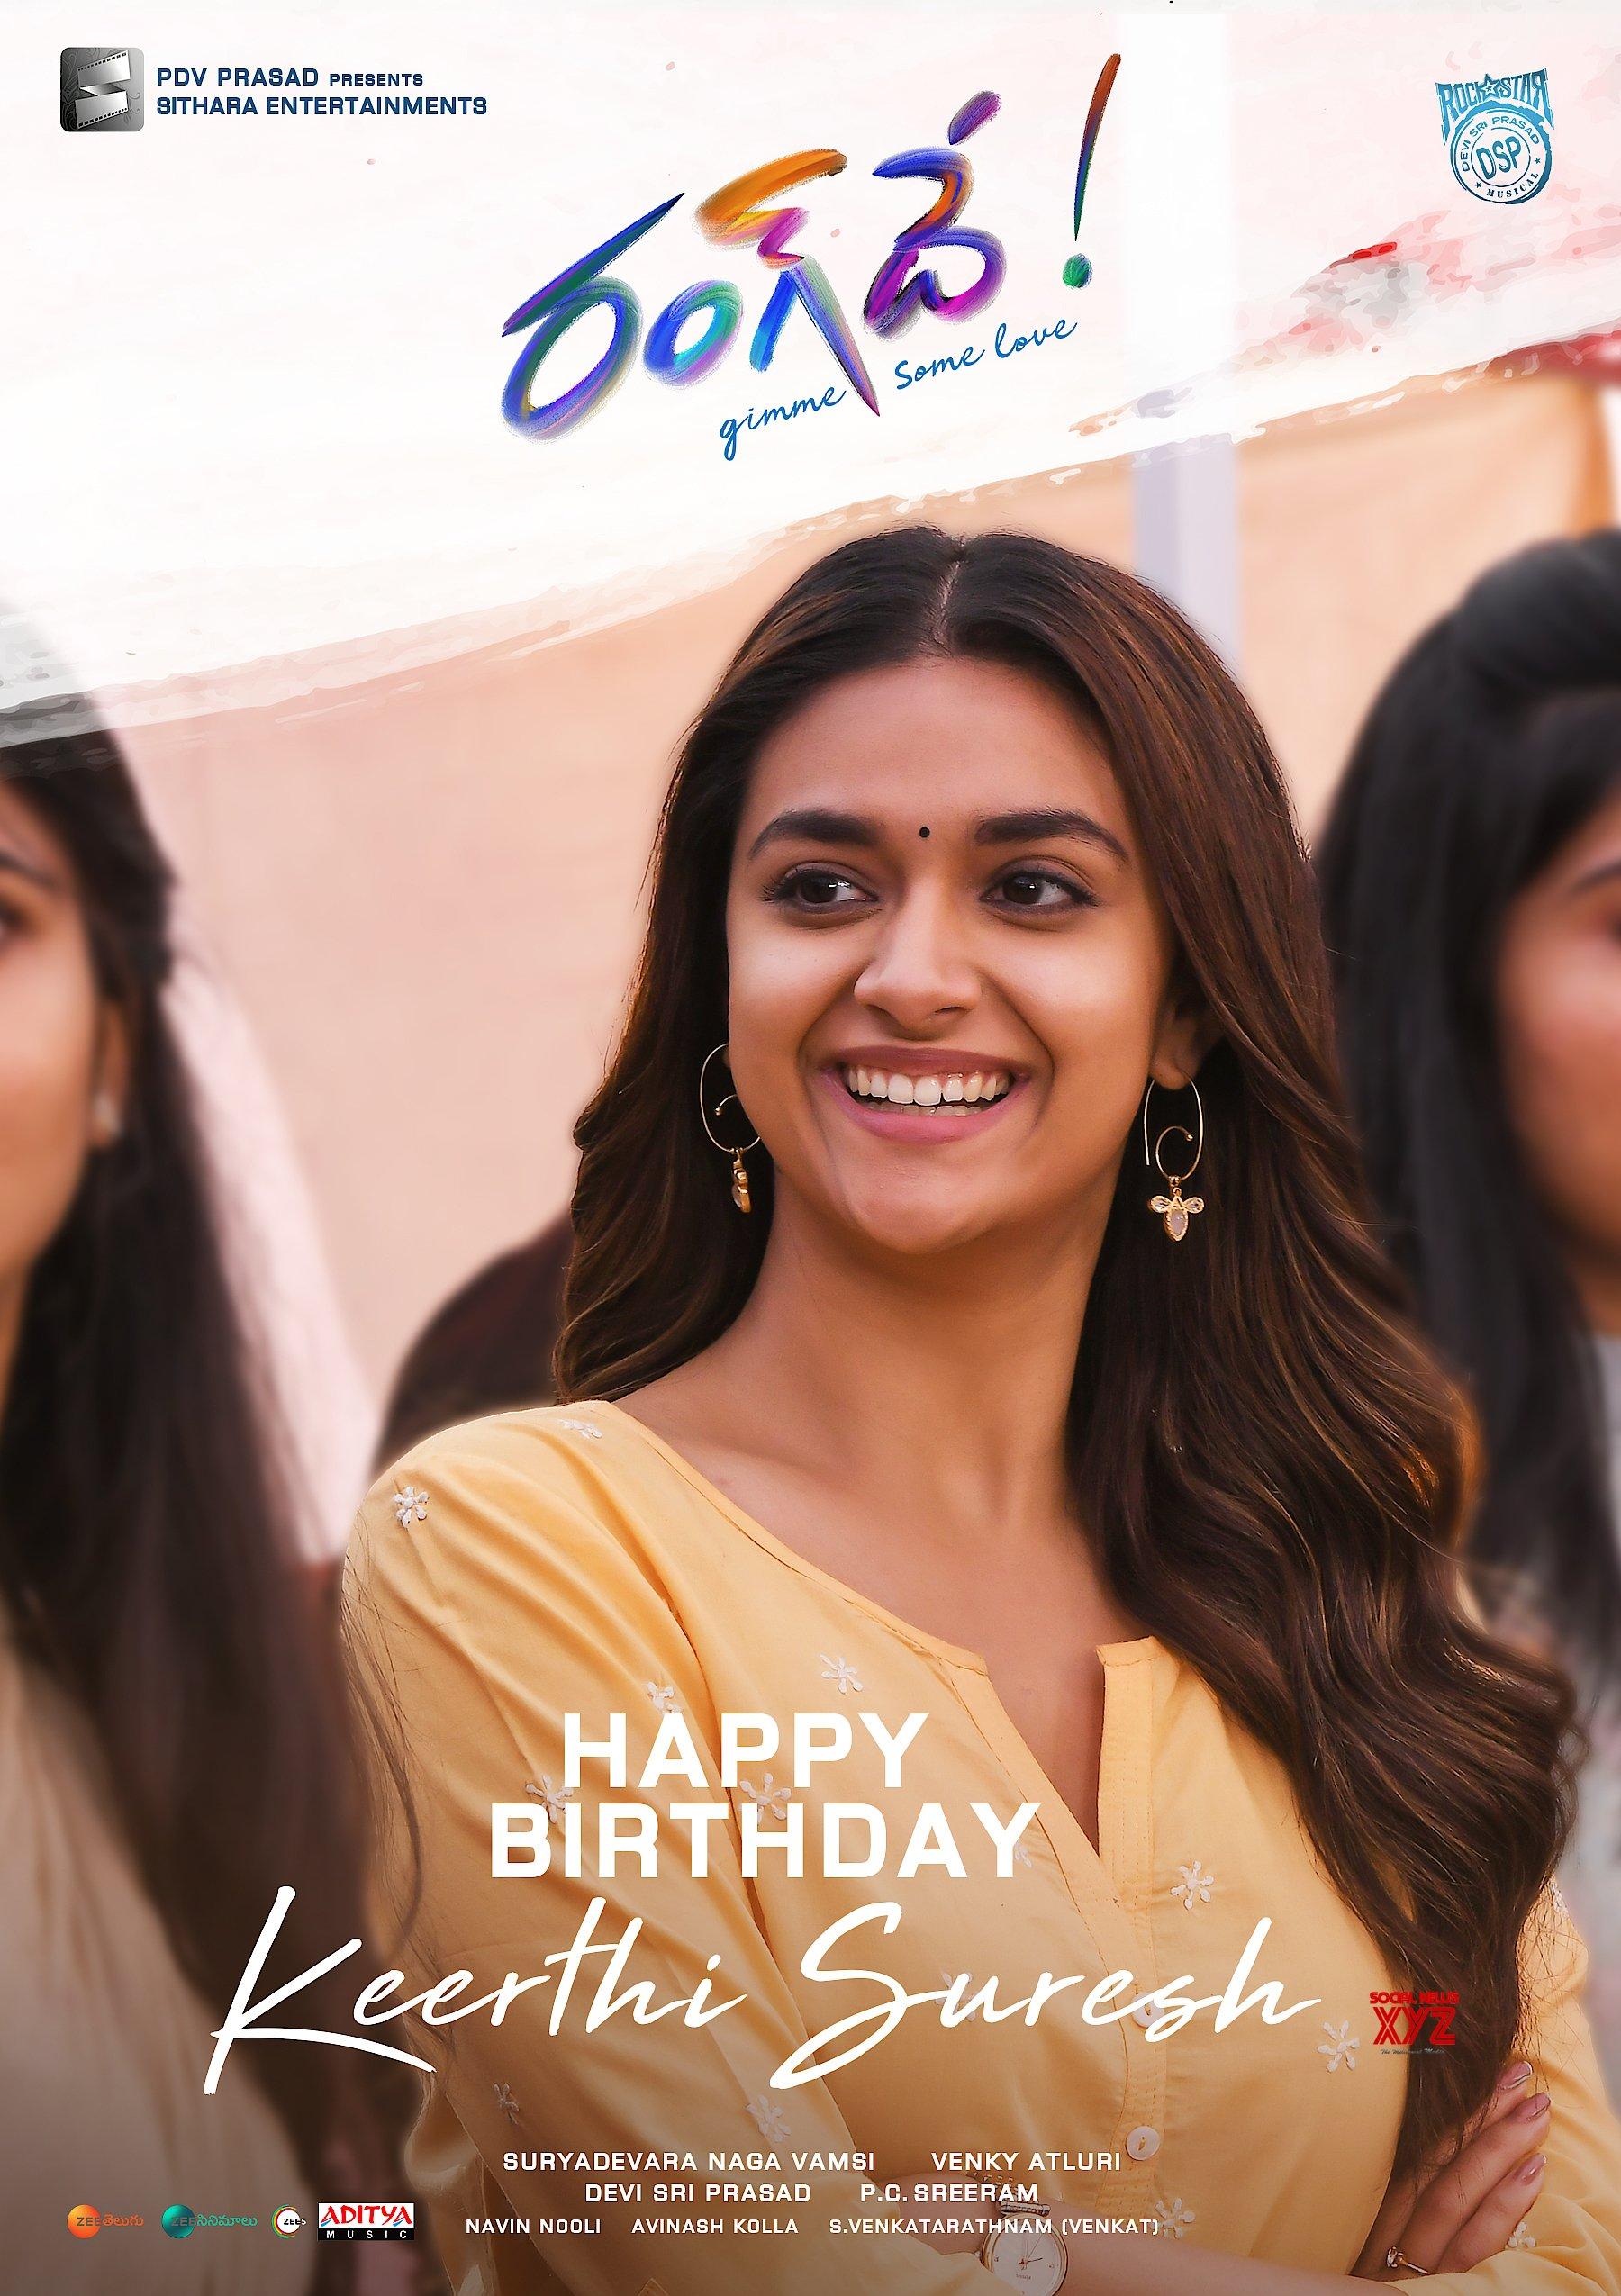 Rang De Team Releases Keerthy Suresh's Poster From Rang De Movie On Her Birthday